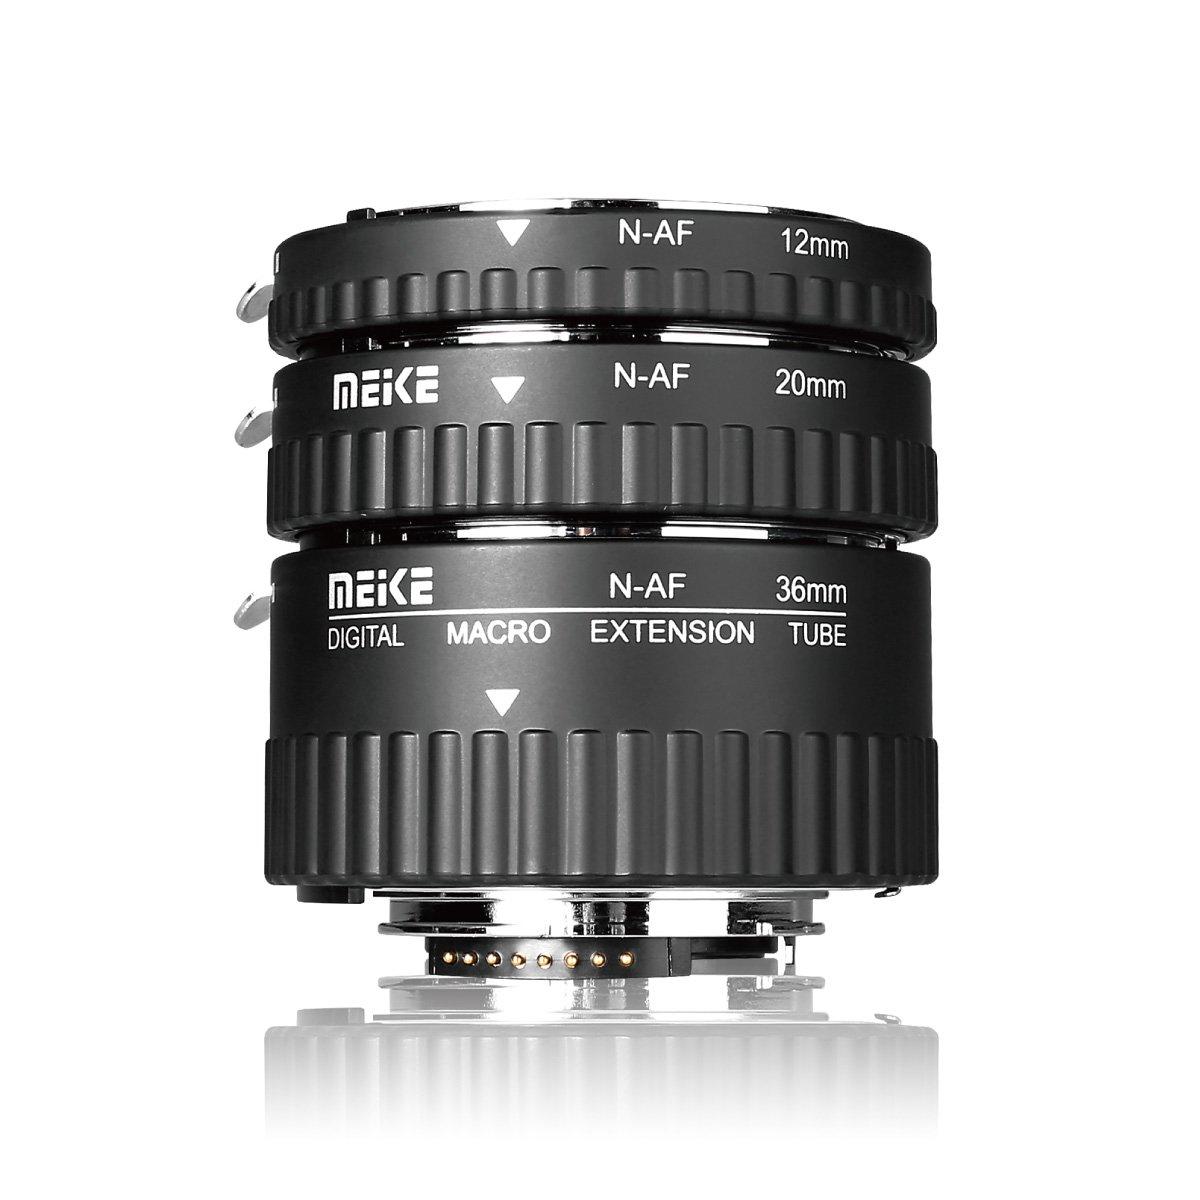 MEIKE MK-N-AF1-A Macro Electronic Mount Auto Foucs Macro Metal Extension Tube Adapter For Nikon DSLR Camera D80 D90 D300 D300SD800 D3100 D3200 D5000 D51000 D5200 D7000 D7100 etc by Meike